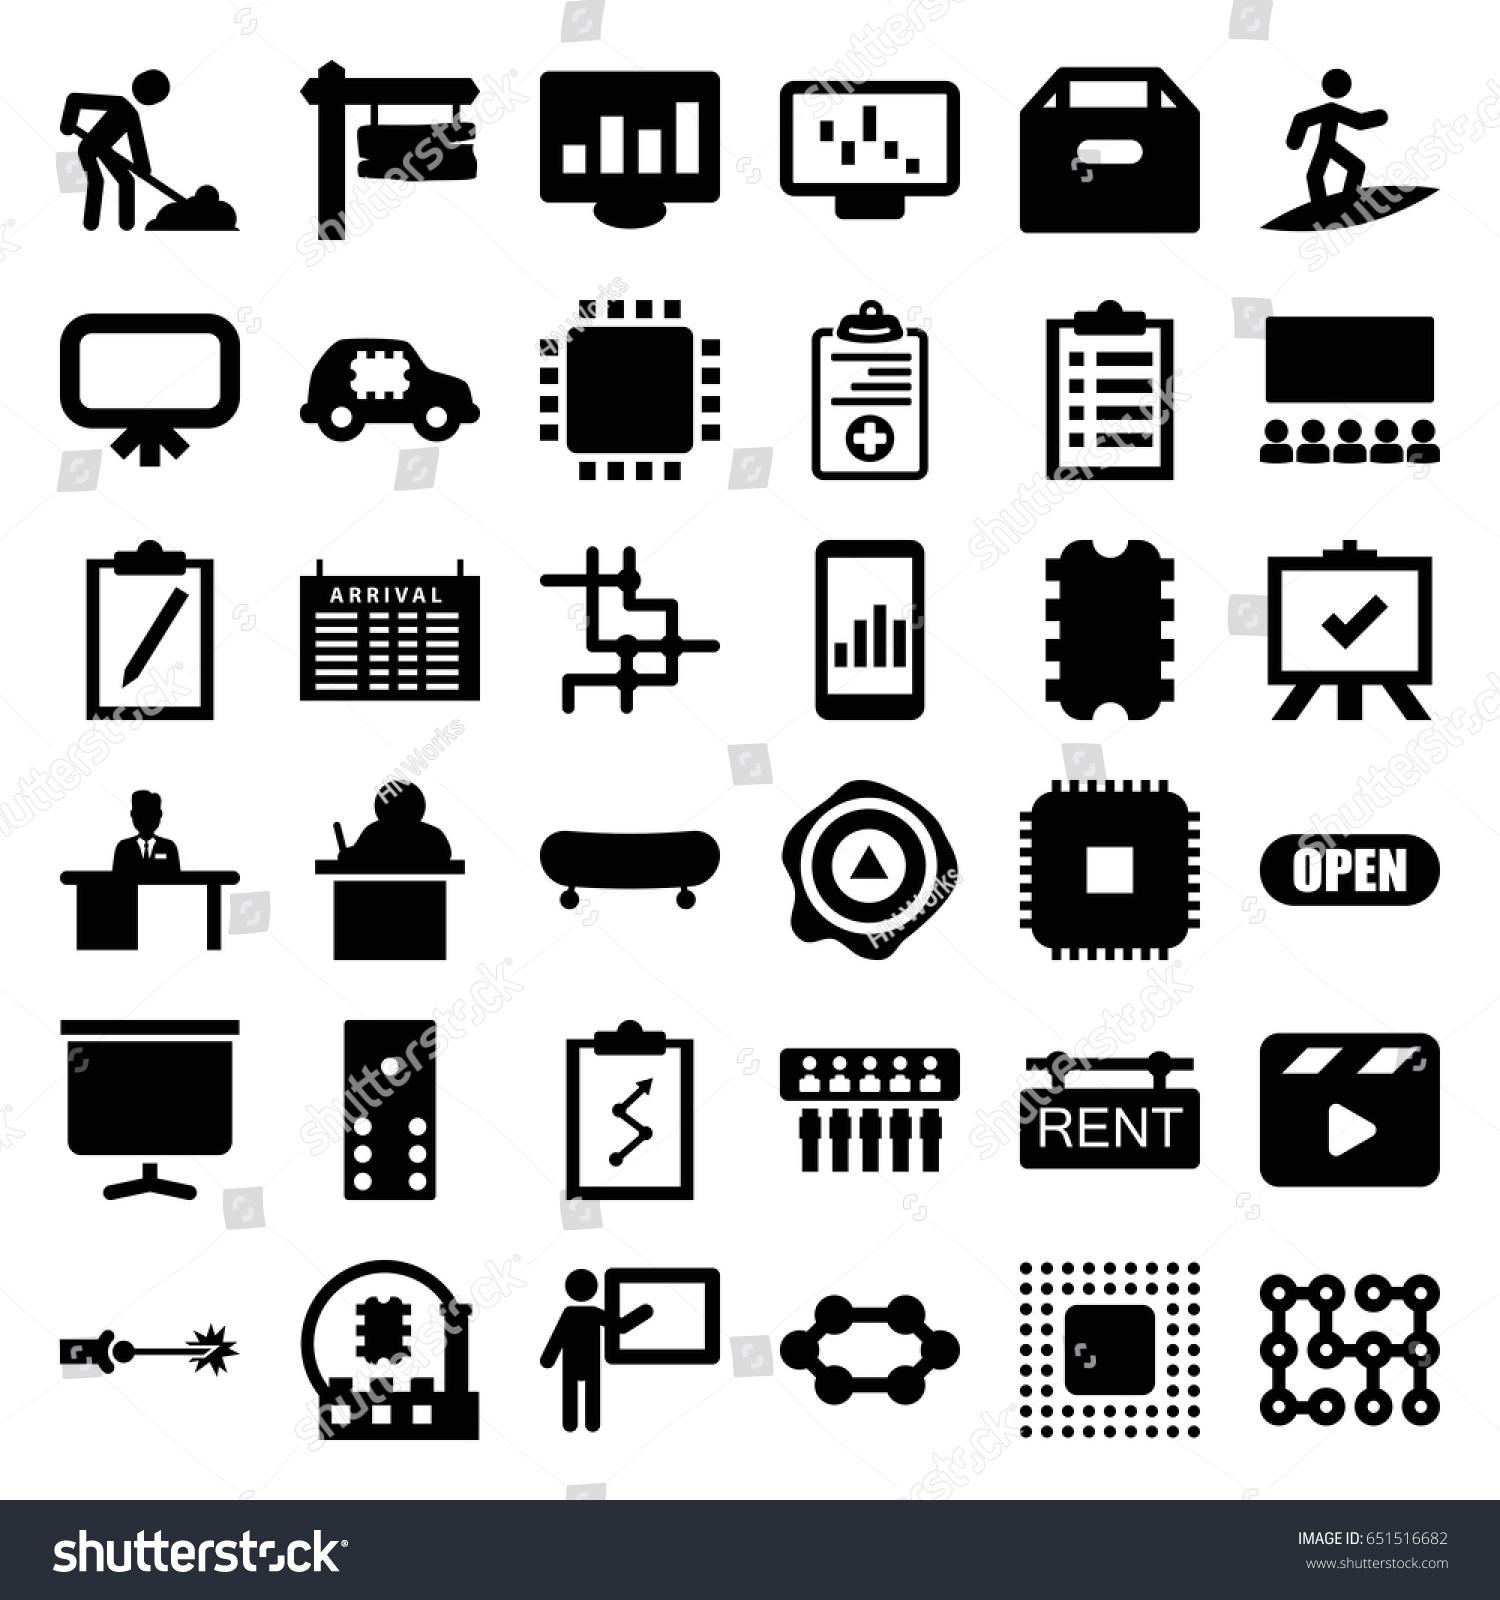 Board icons set set 36 board stock vector 651516682 shutterstock board icons set set of 36 board filled icons such as arrival table board buycottarizona